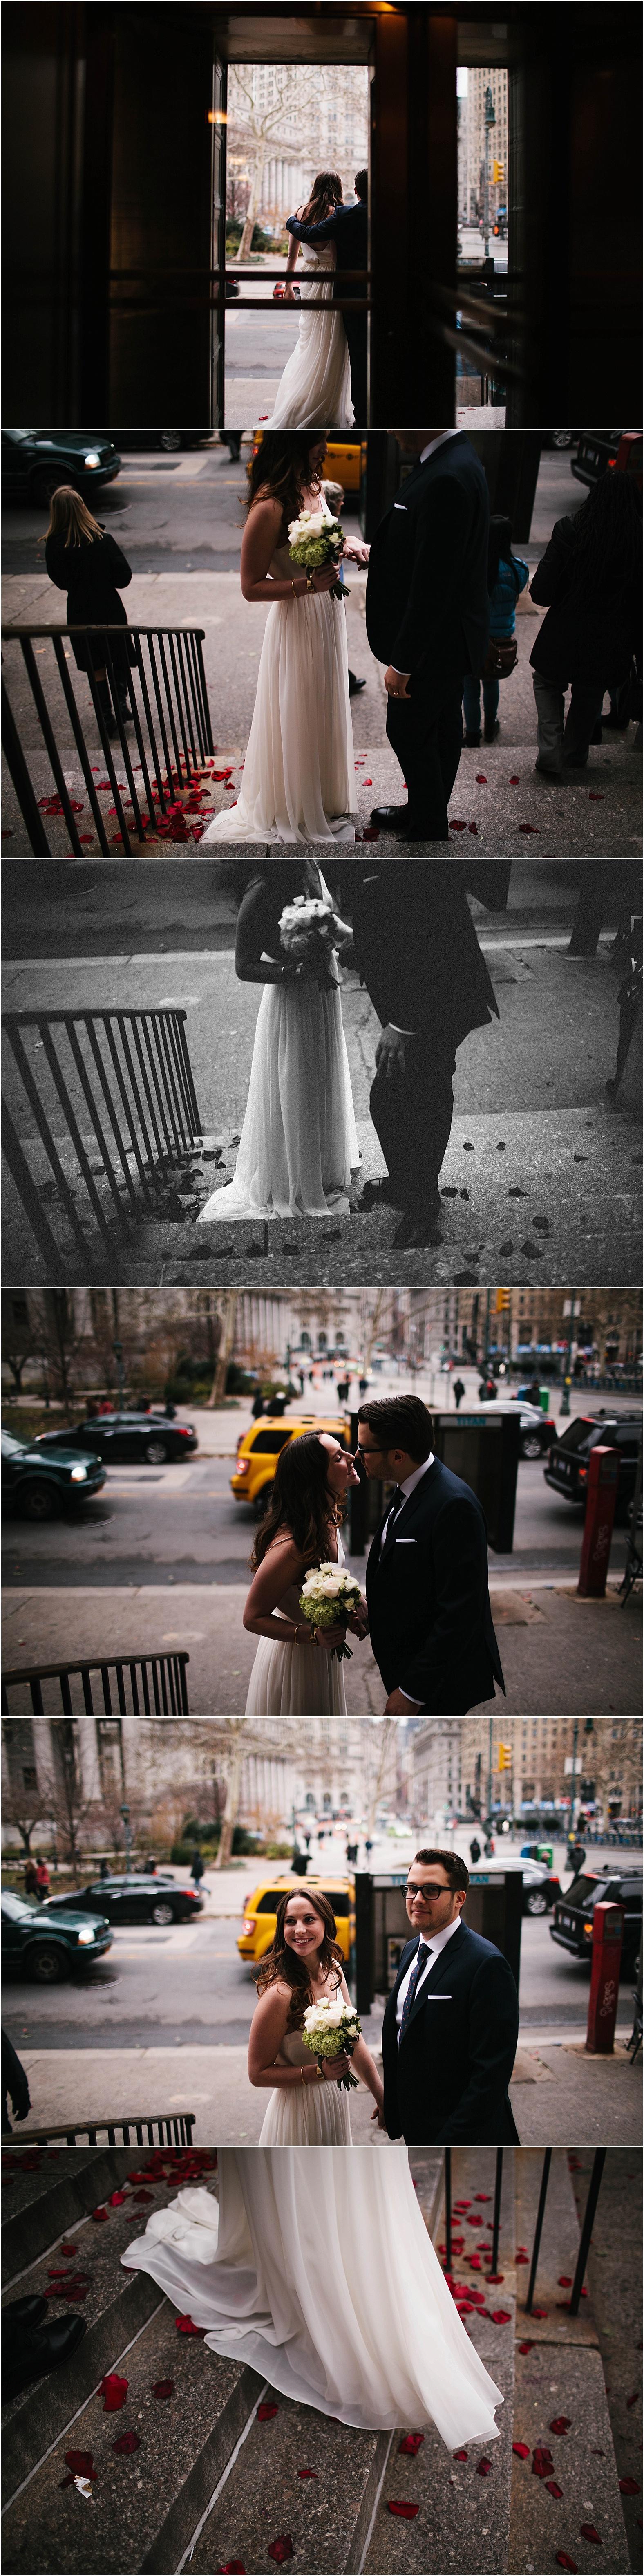 manzanita photo by rebecca caridad internation wedding photogrpaher, colorado wedding photographer, nashville wedding photographer_0615.jpg